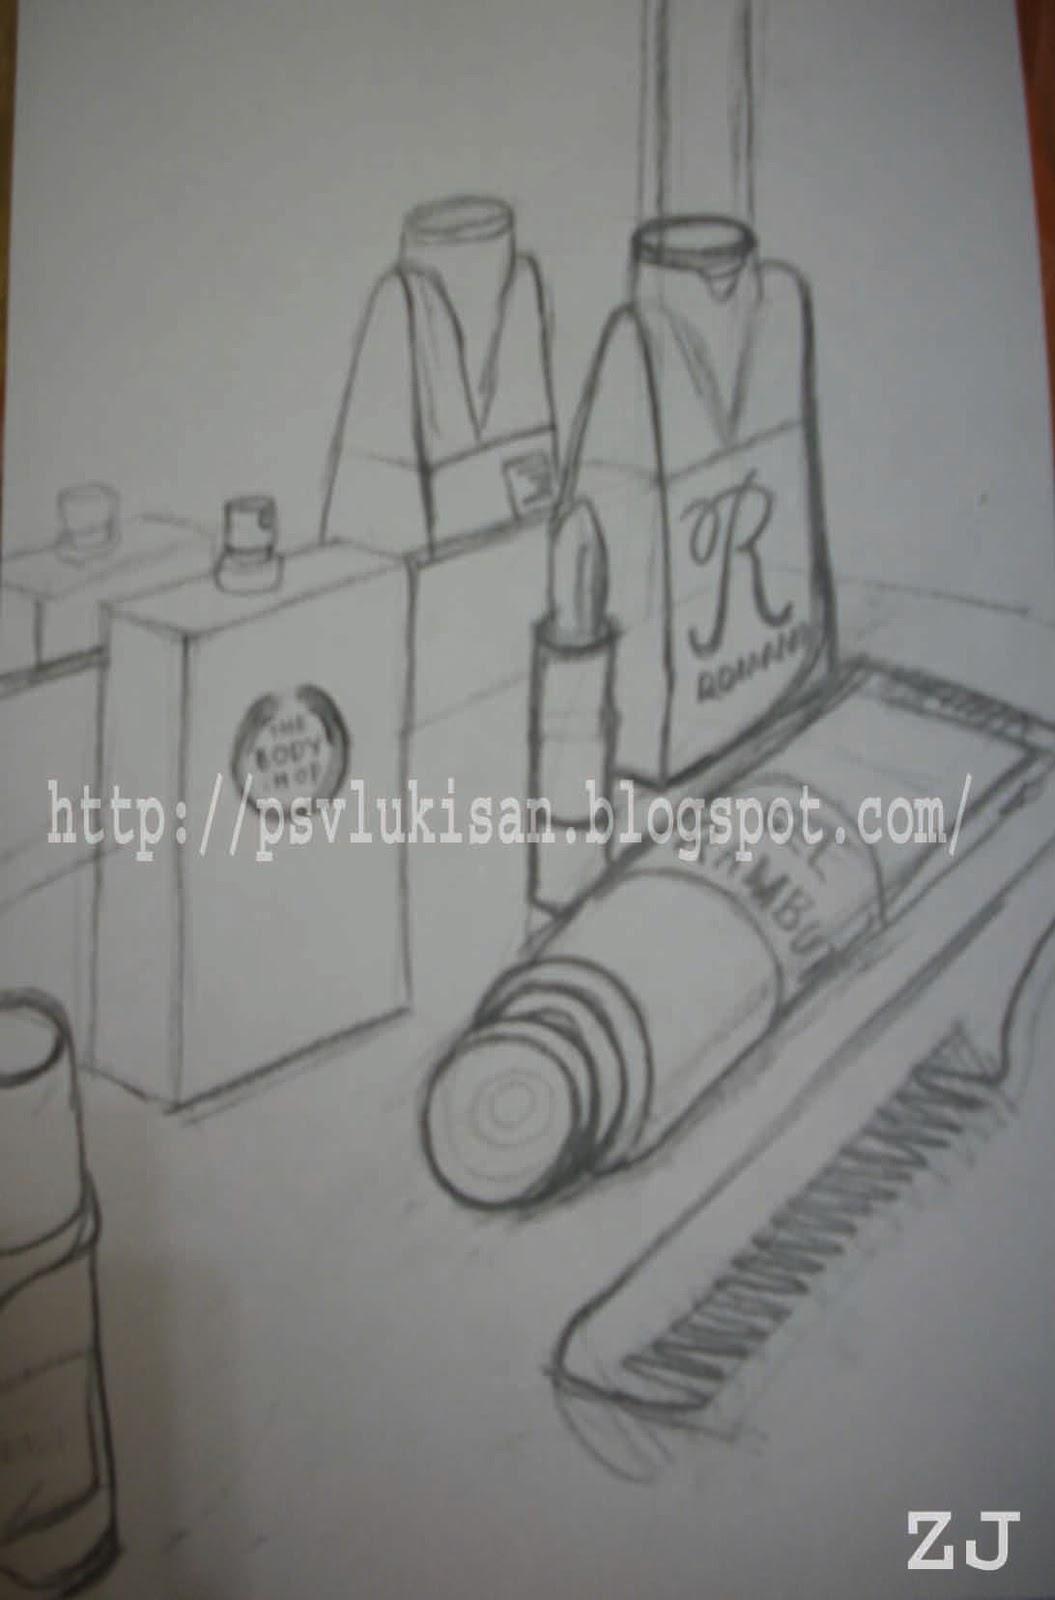 Pendidikan Seni Visual (lukisan): SOALAN SPM 2010 kertas 2